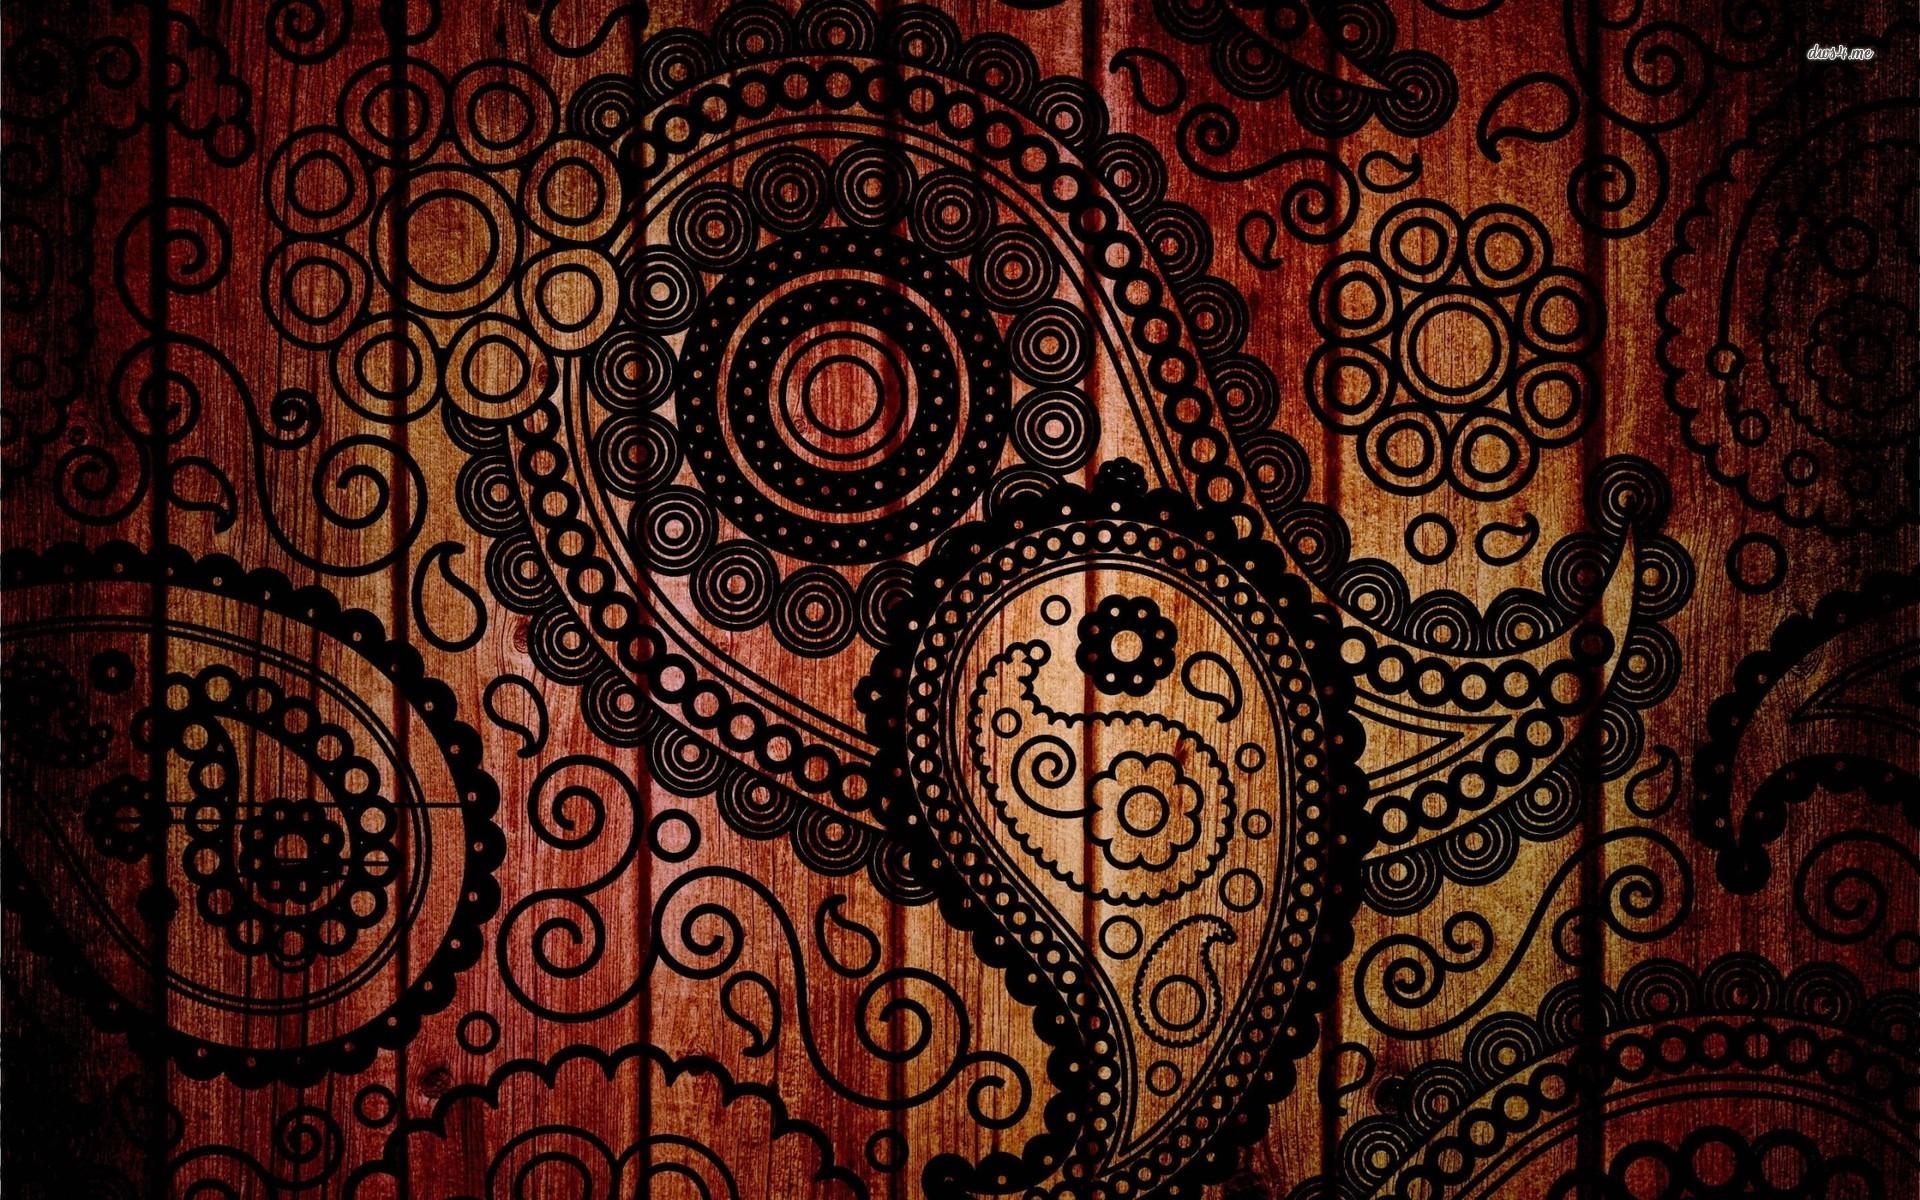 Hd Wallpapers Abstract Paisley ...